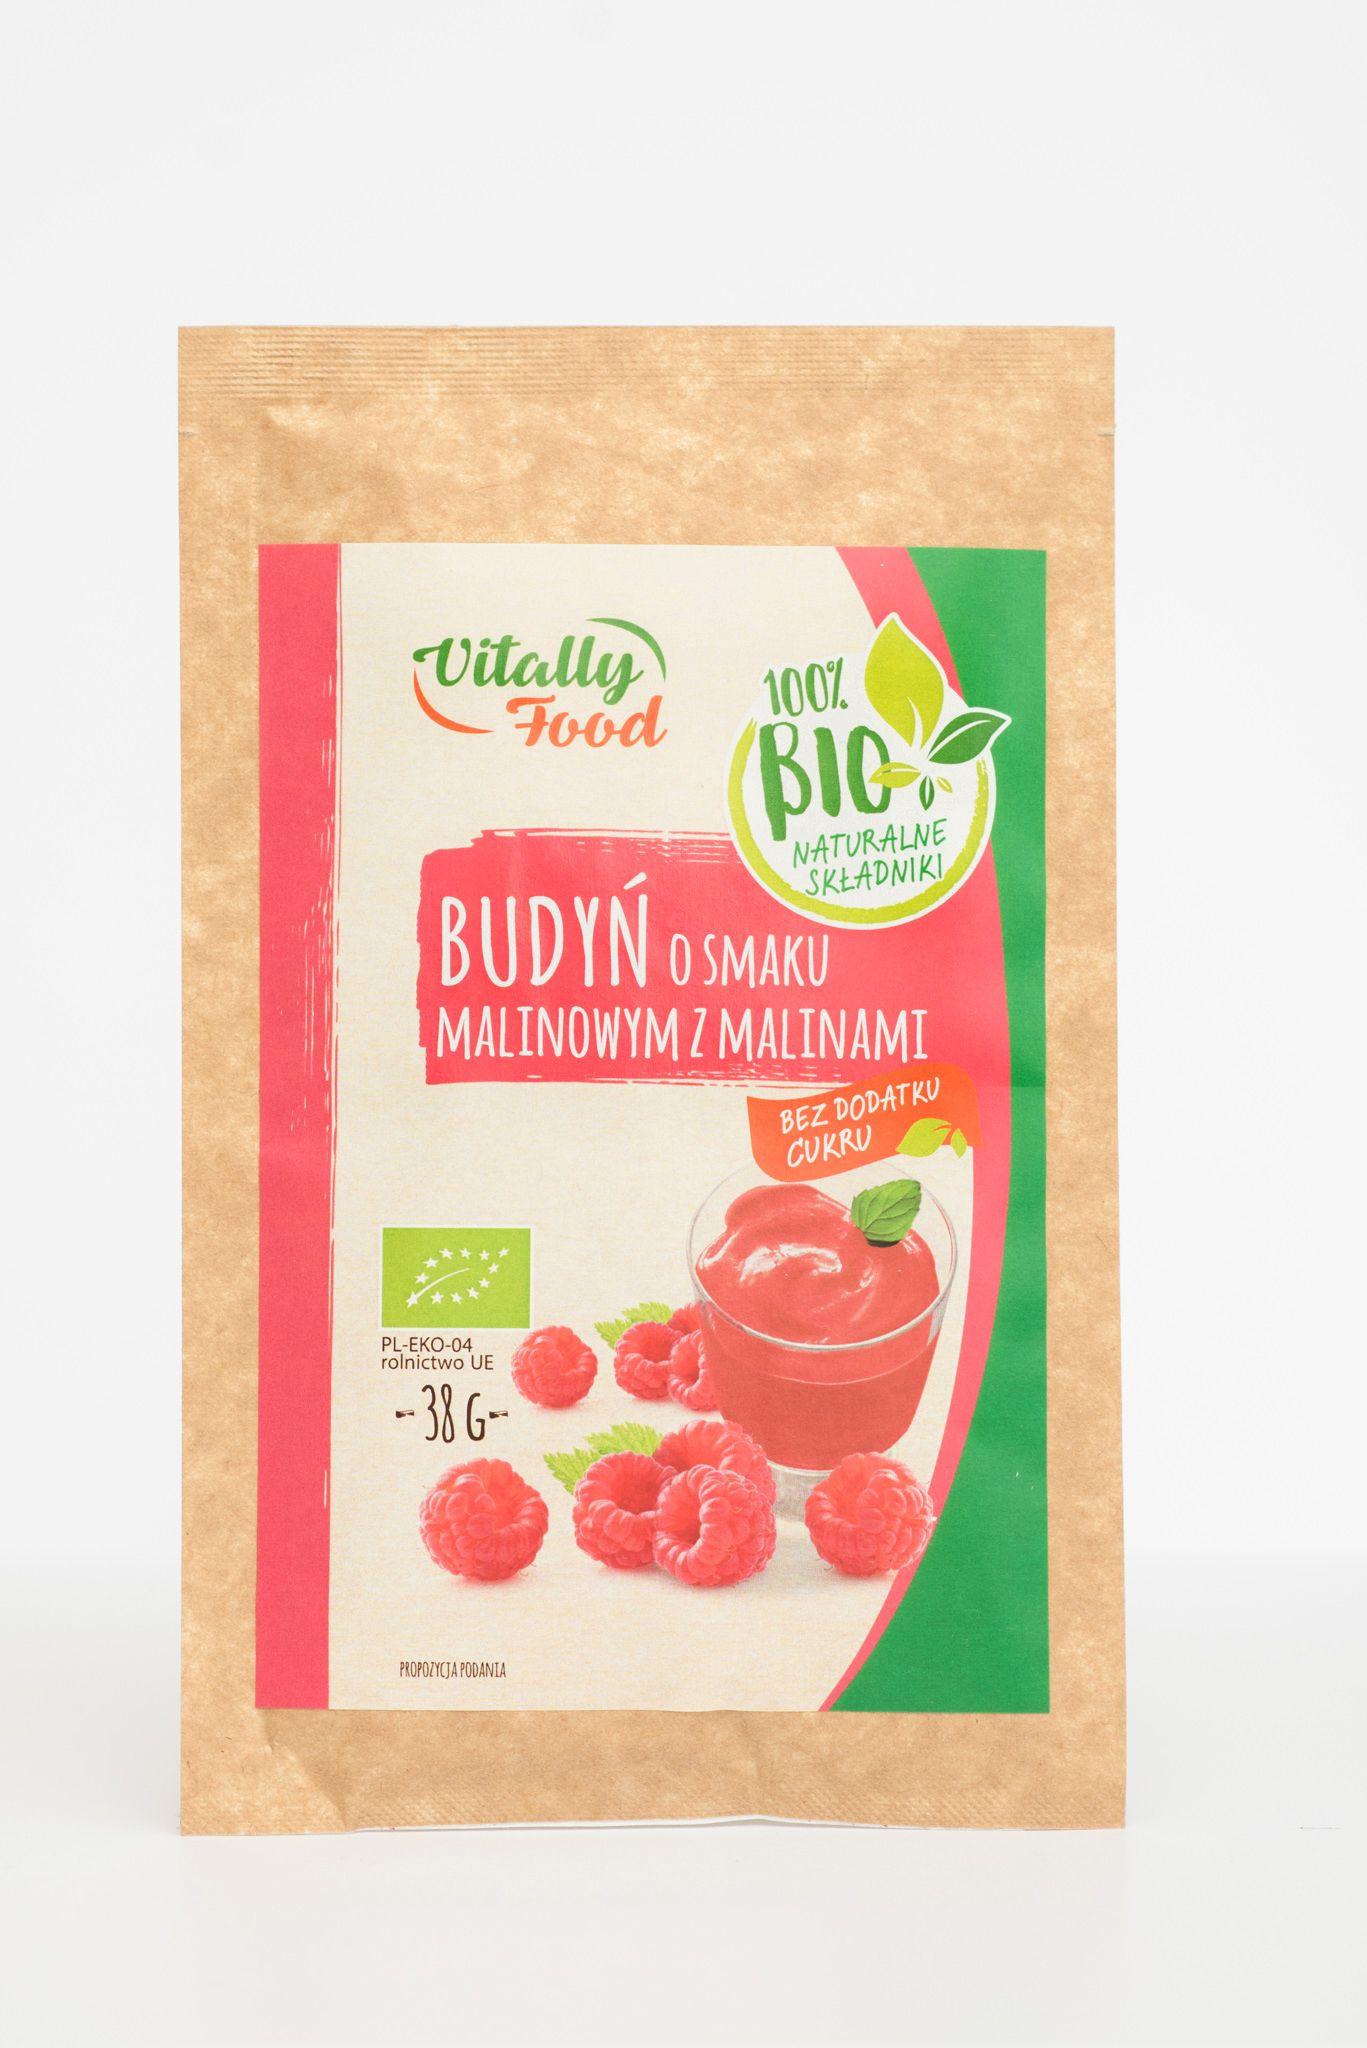 BIO Budyń smak malina z malinami 38g Vitally Food